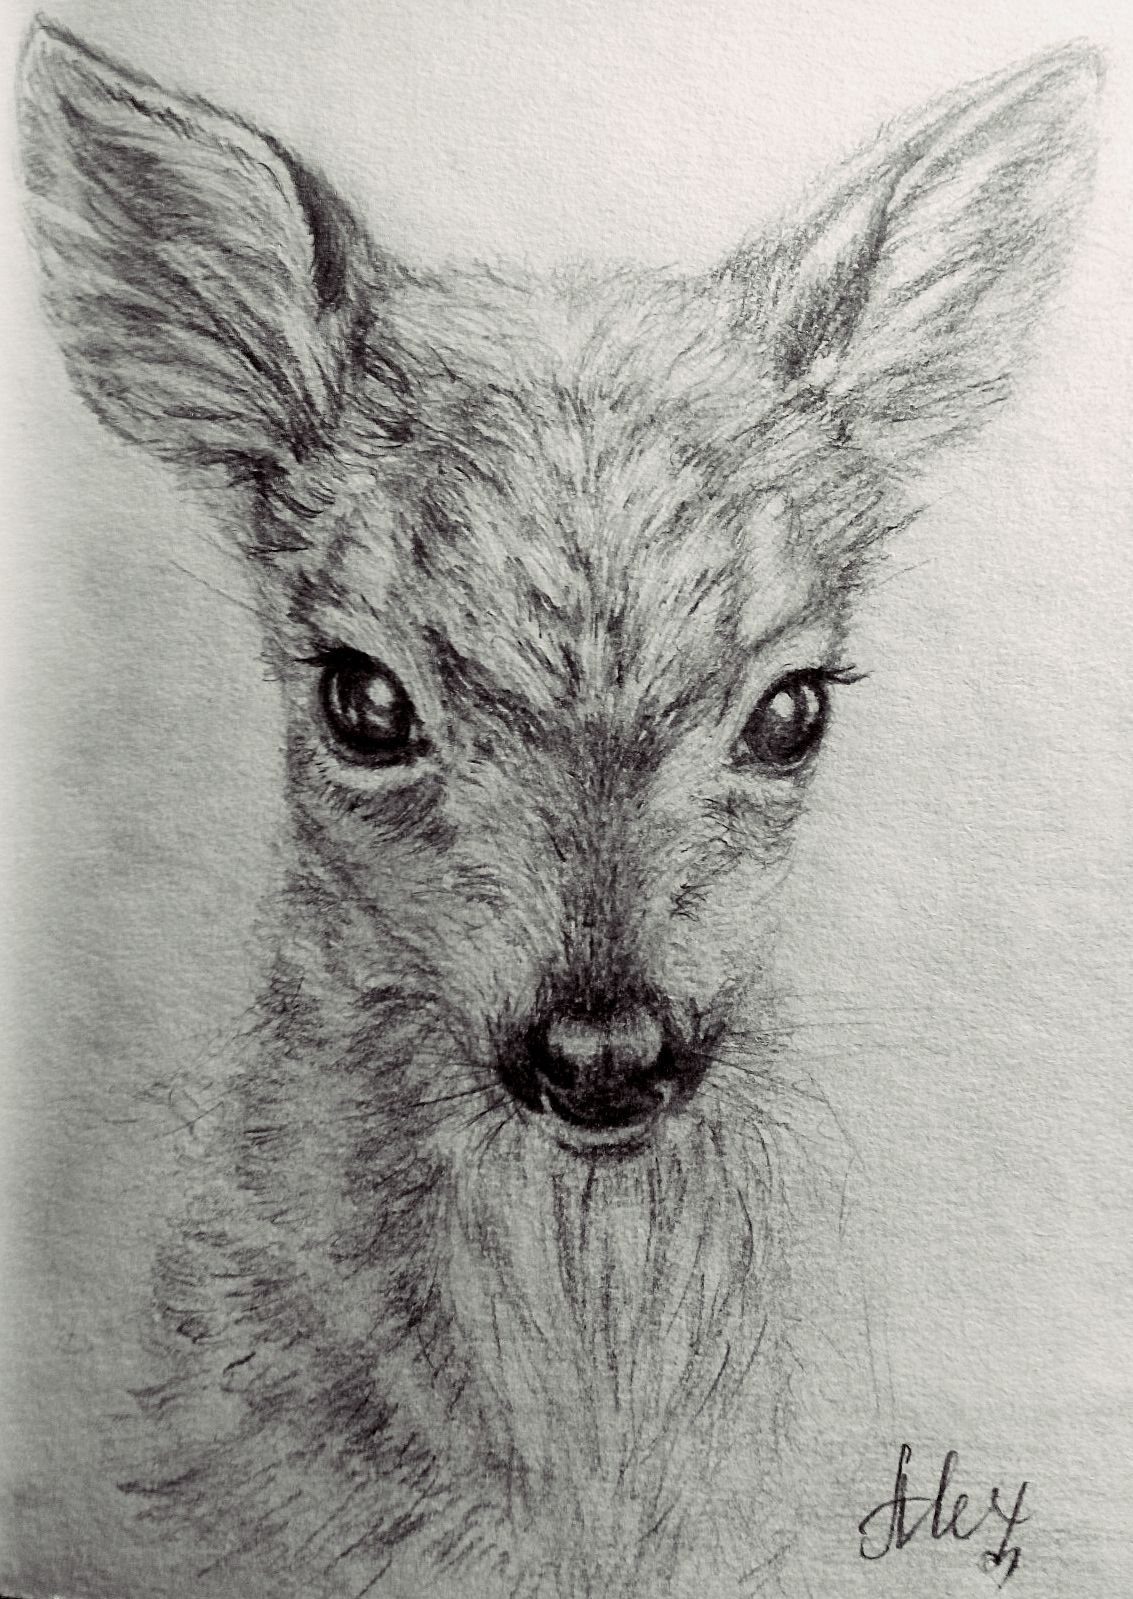 Fawn drawing pencil cute beautiful pencil drawing of a fawn